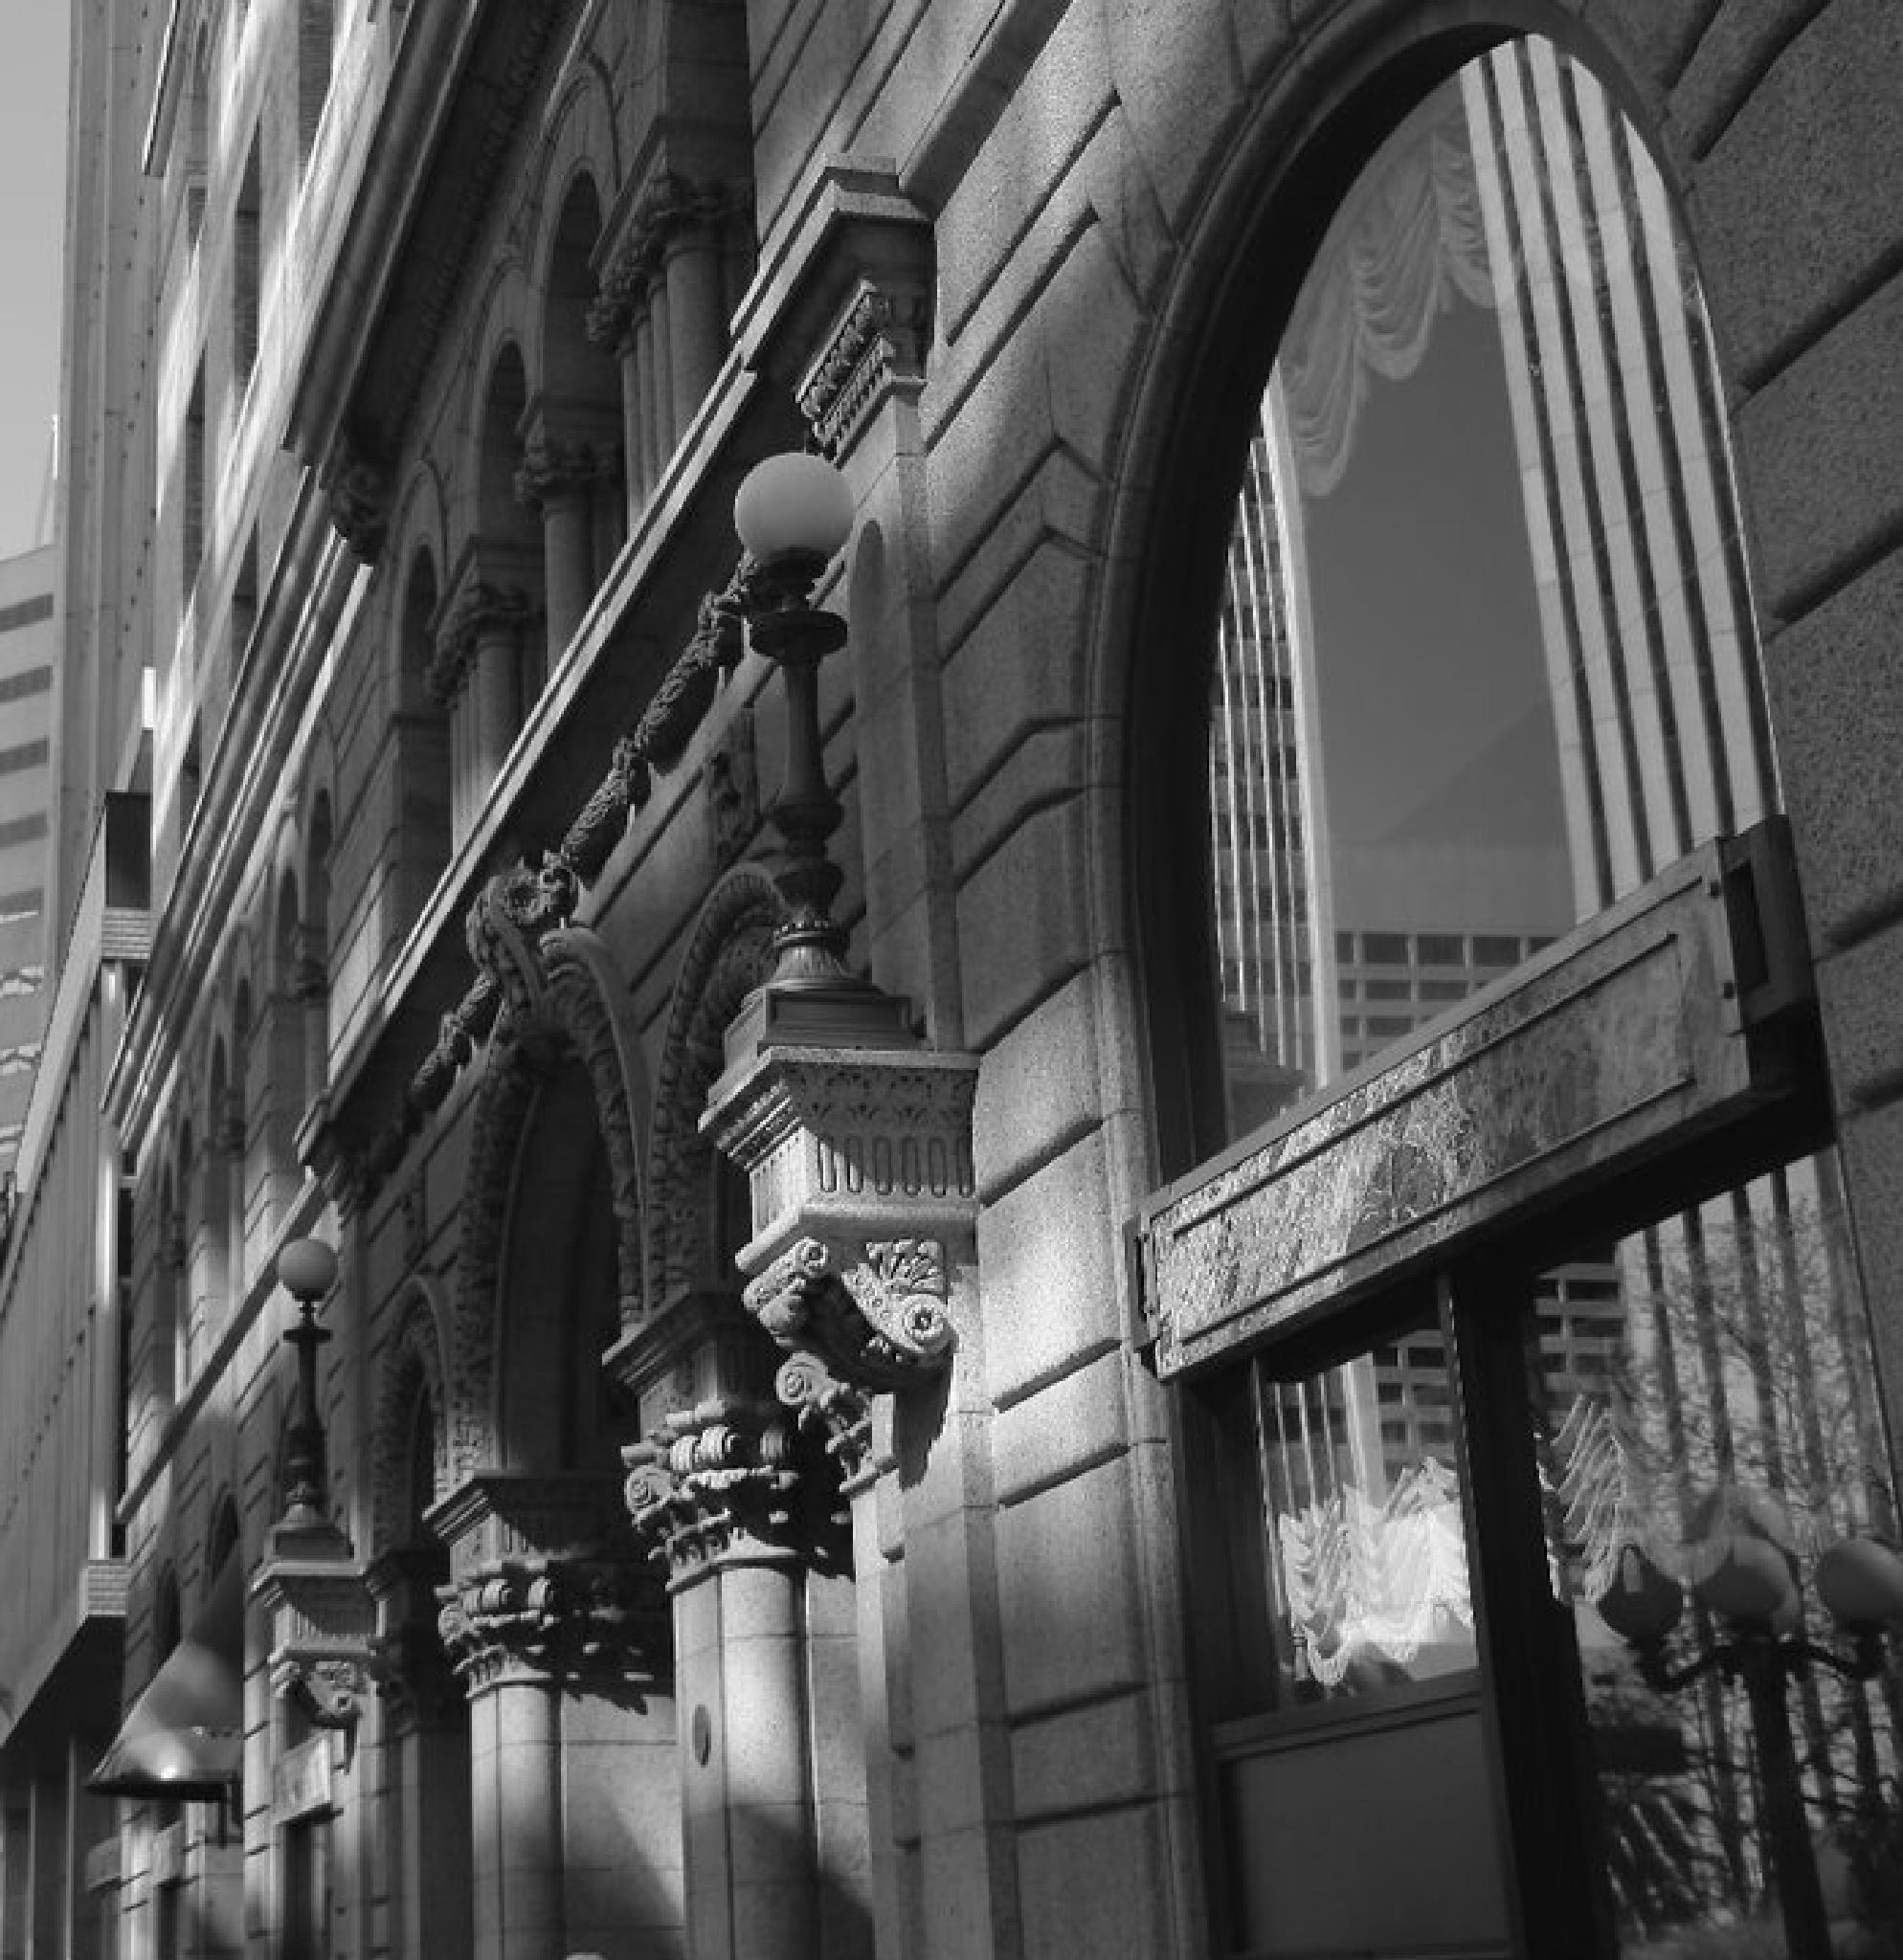 Downtown Denver by tdurard